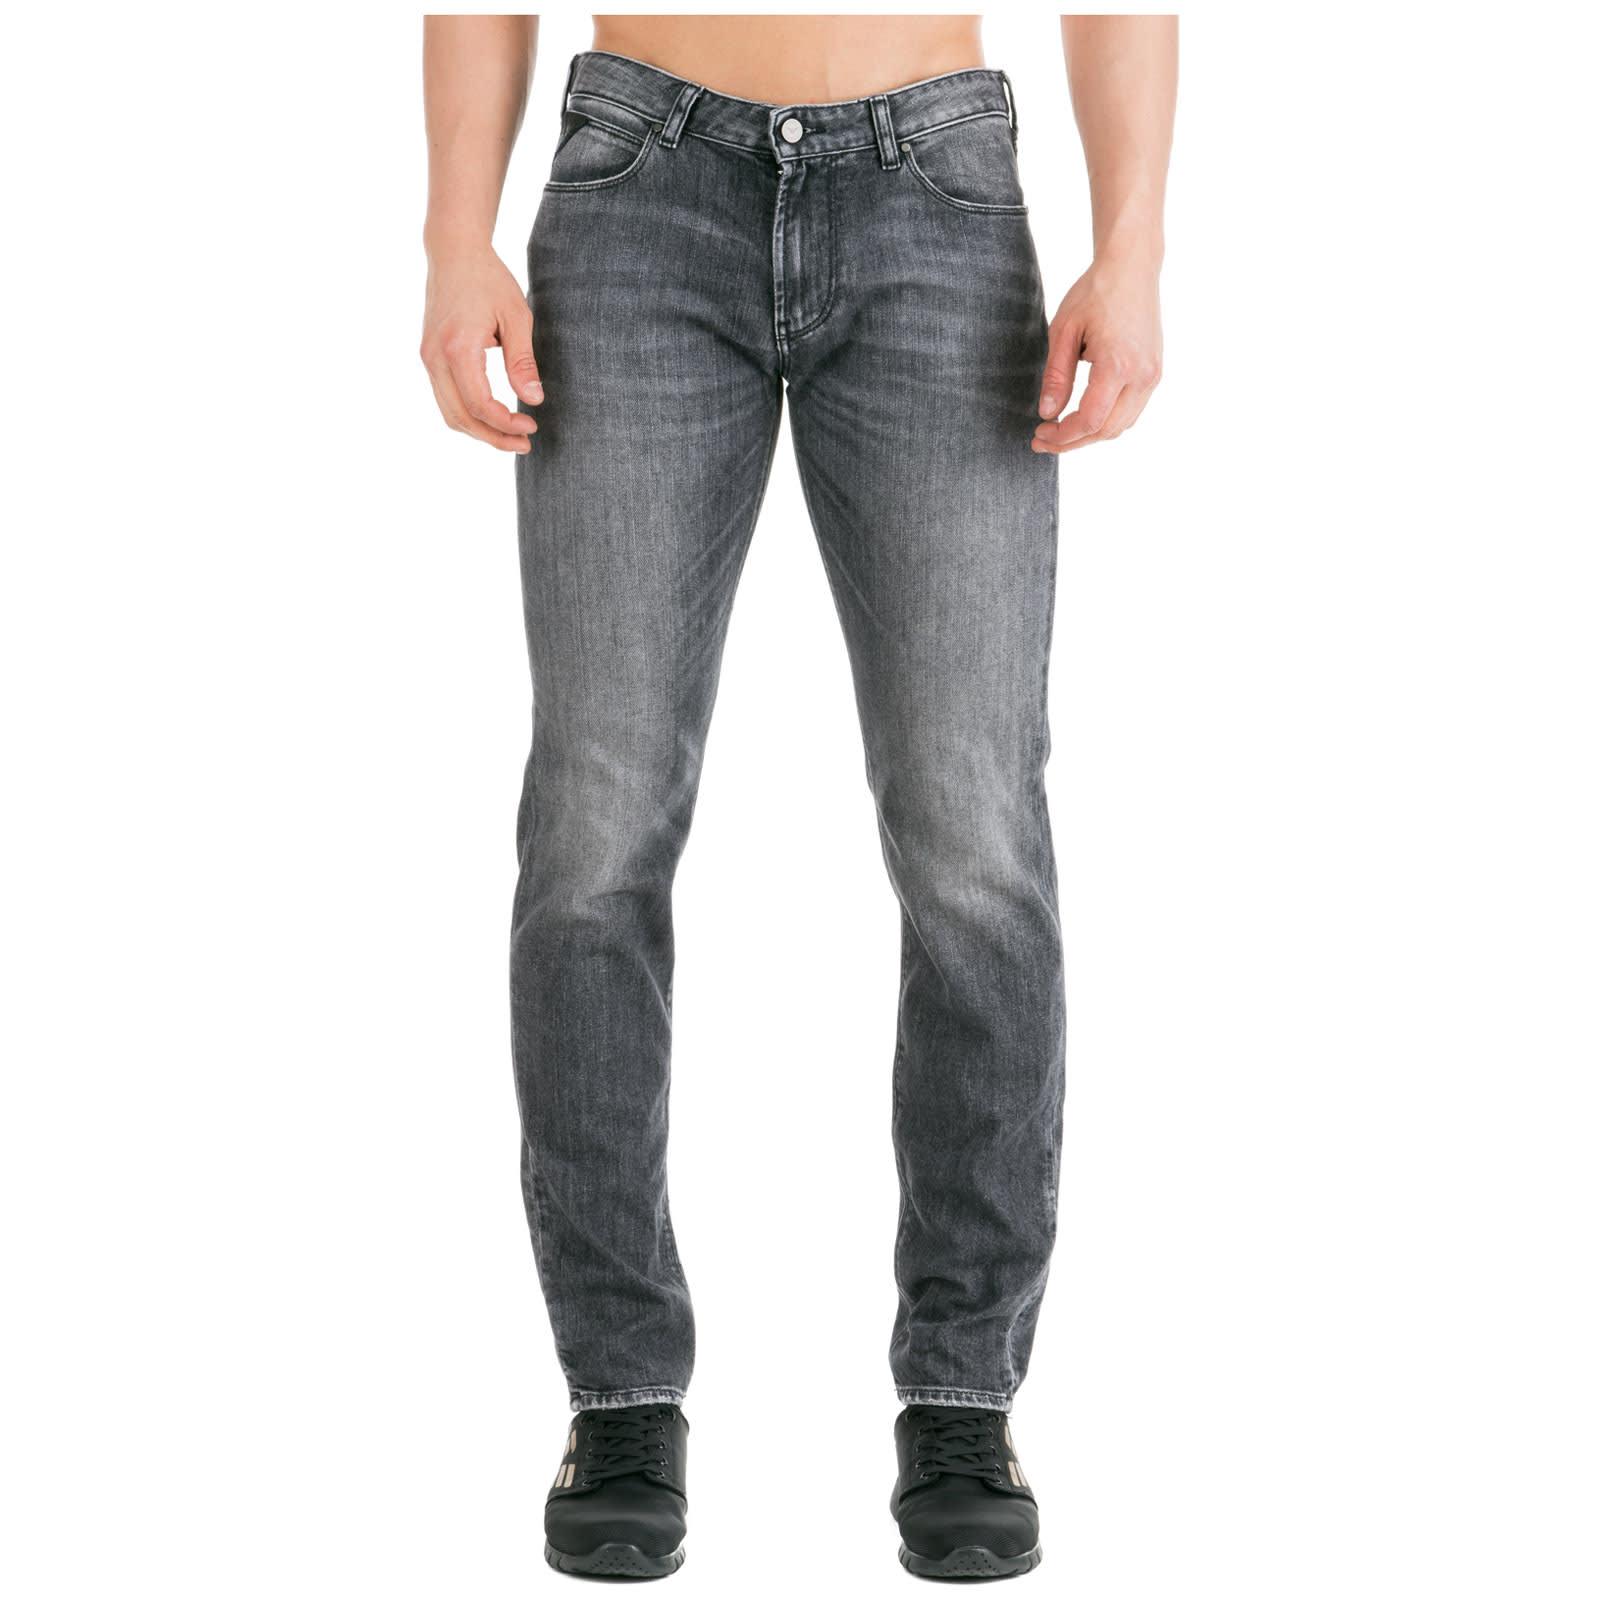 2100ddf51b Emporio Armani Jeans Denim Slim Fit